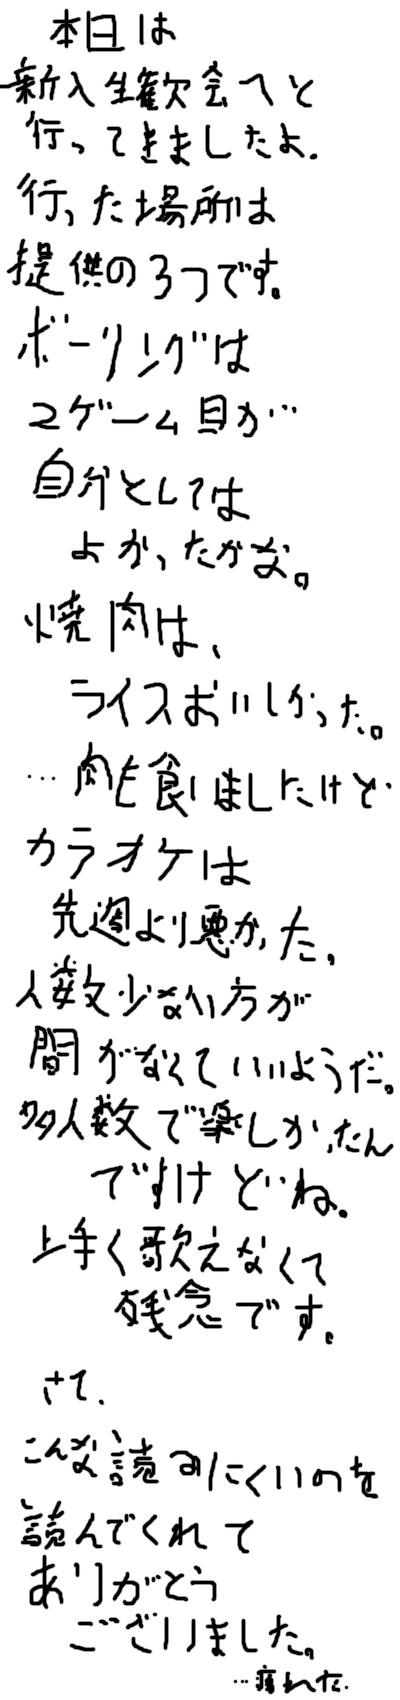 080518_本文